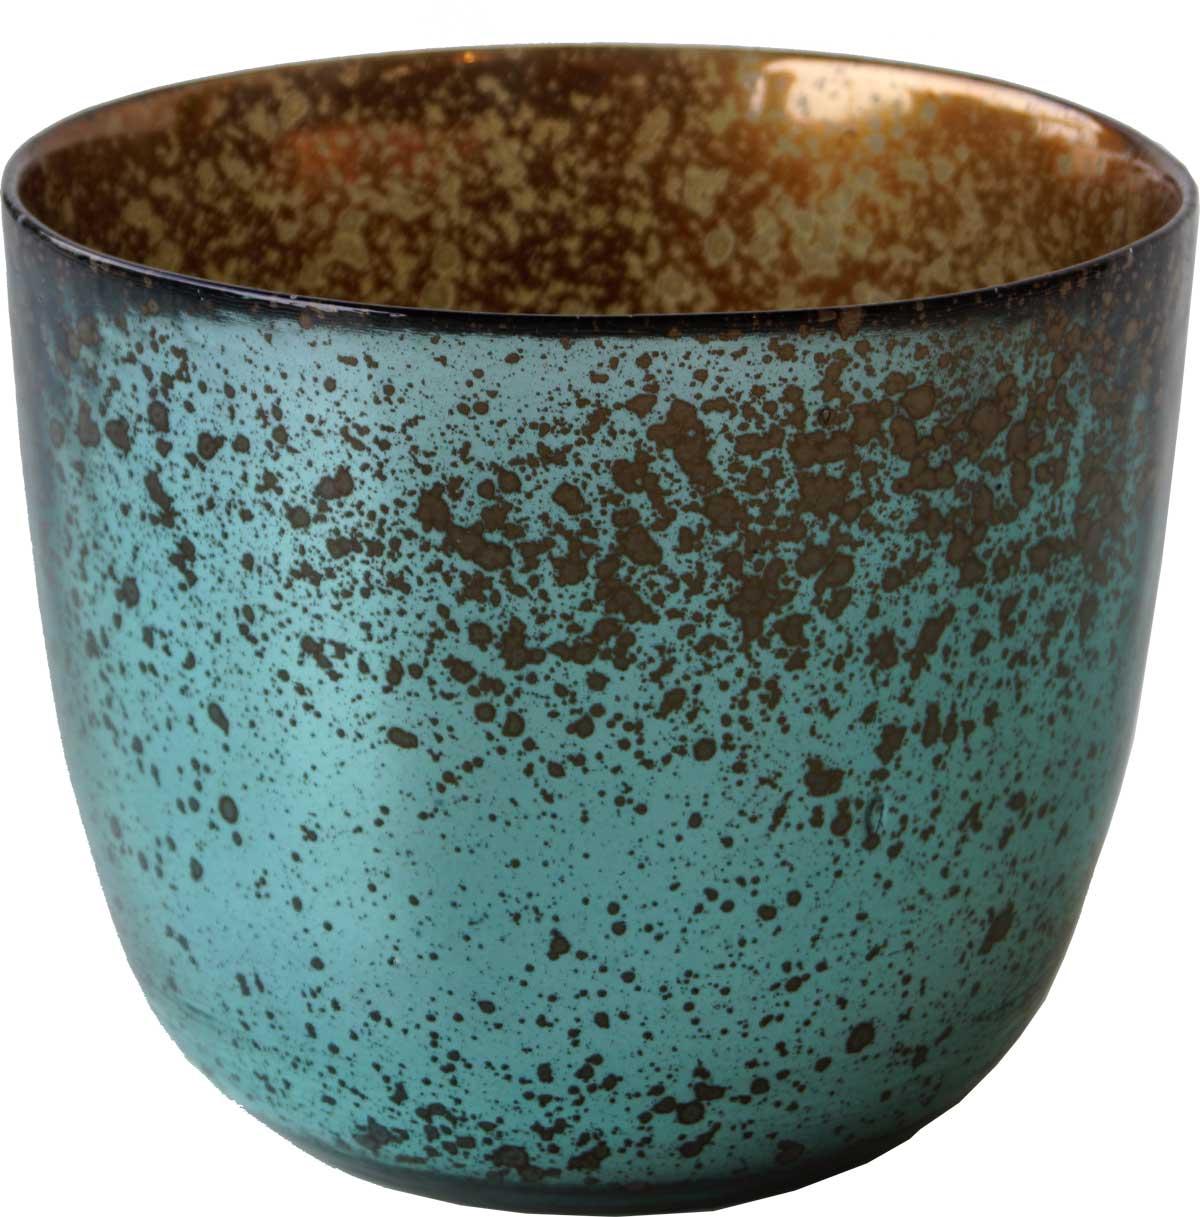 trademark living – Trademark living smuk stor vase i fine farvenuancer - kobber og grøn på boboonline.dk